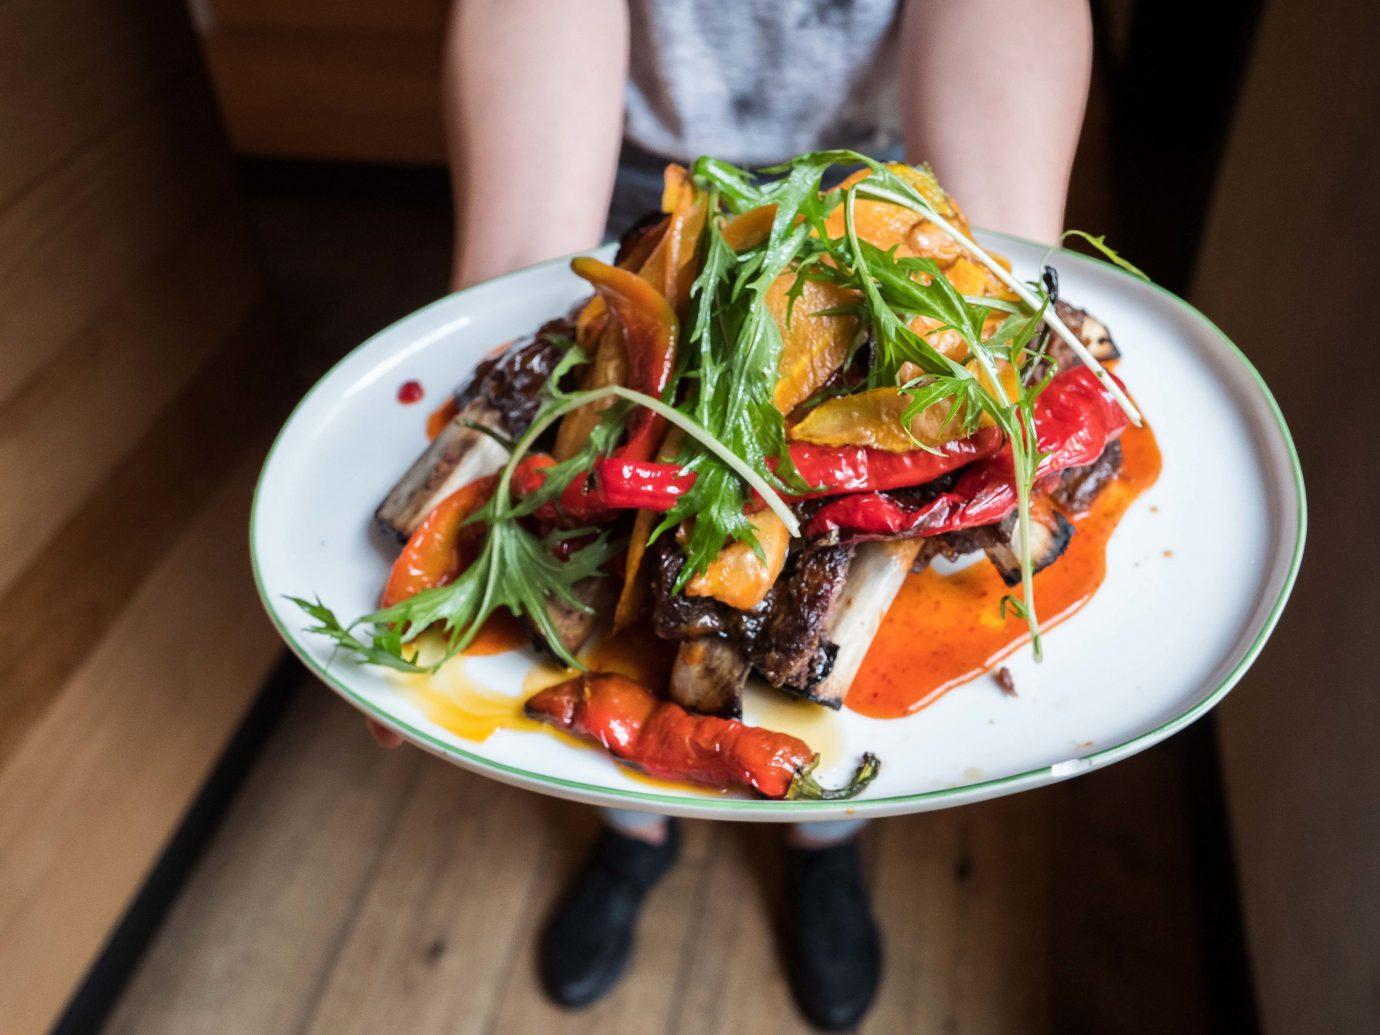 Food + Drink Travel Tips person food plate dish indoor salad vegetarian food cuisine vegetable Seafood meal thai food asian food recipe